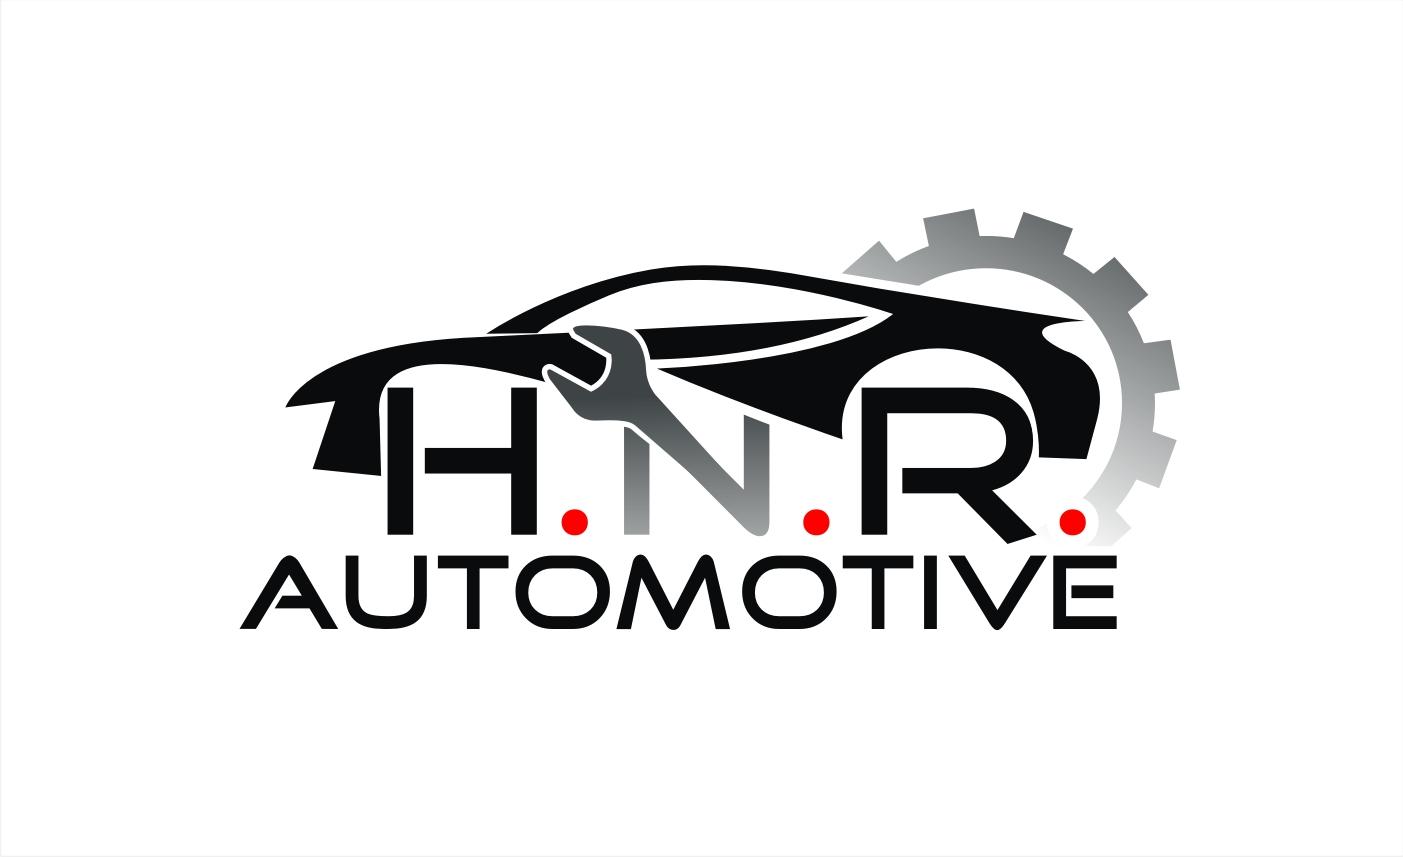 bold serious car repair logo design for h n r automotive by hih7 rh designcrowd com